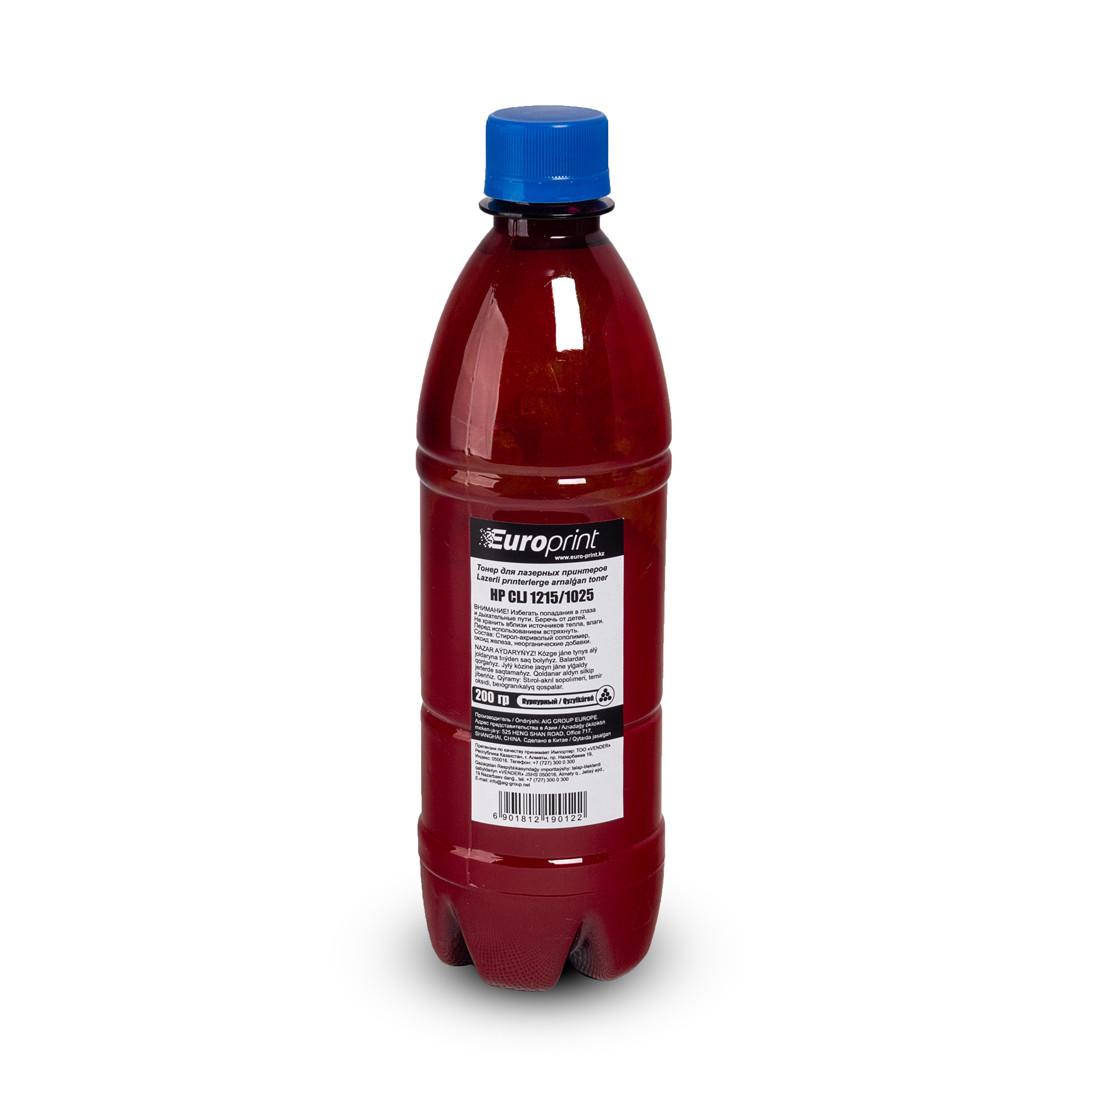 Тонер Europrint HP CLJ 1215/1025 Пурпурный (200 гр)